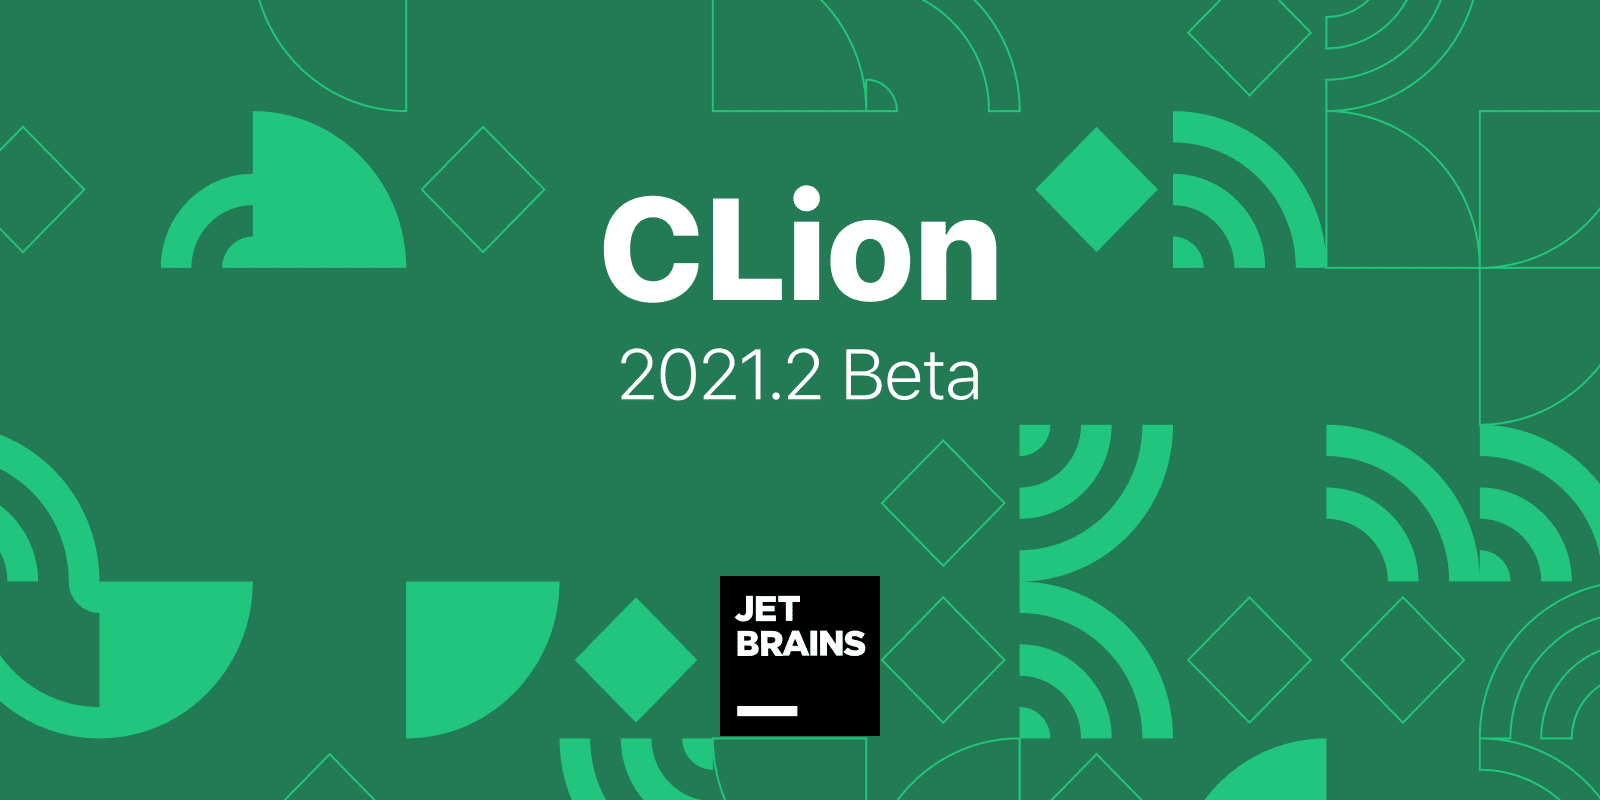 CLion 2021.2 Goes Beta!